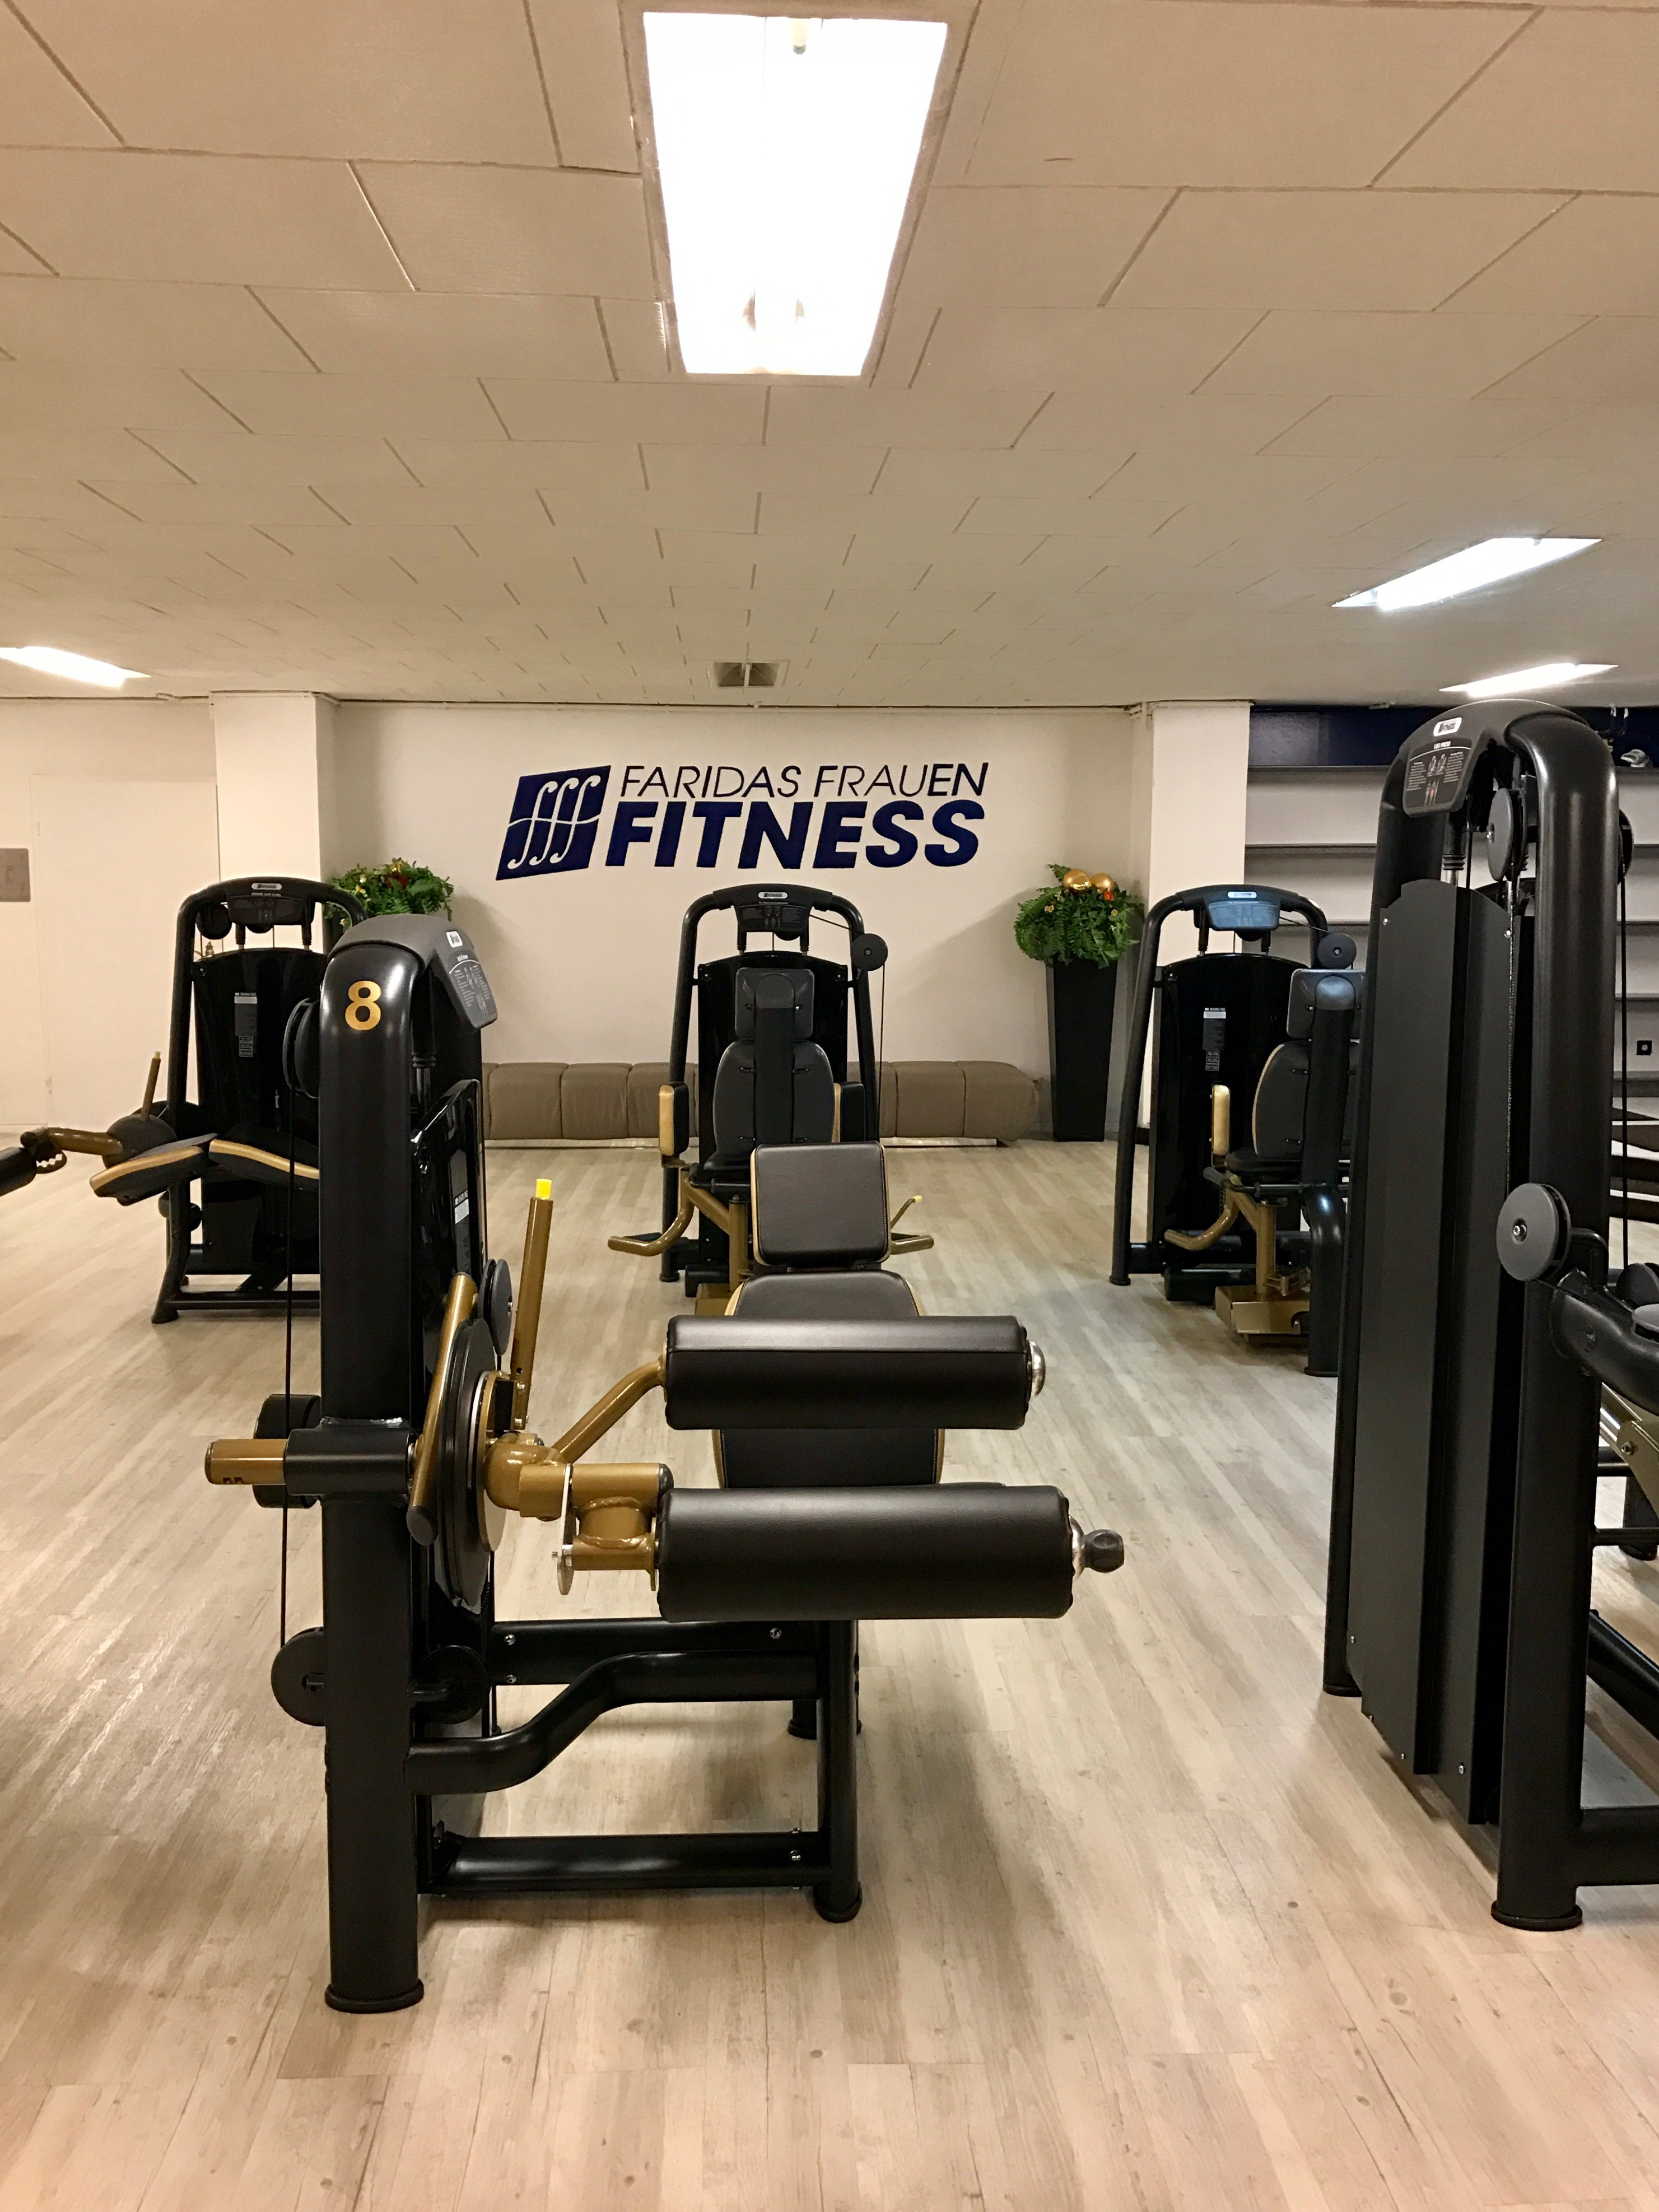 Faridas Frauen Fitness Hamburg